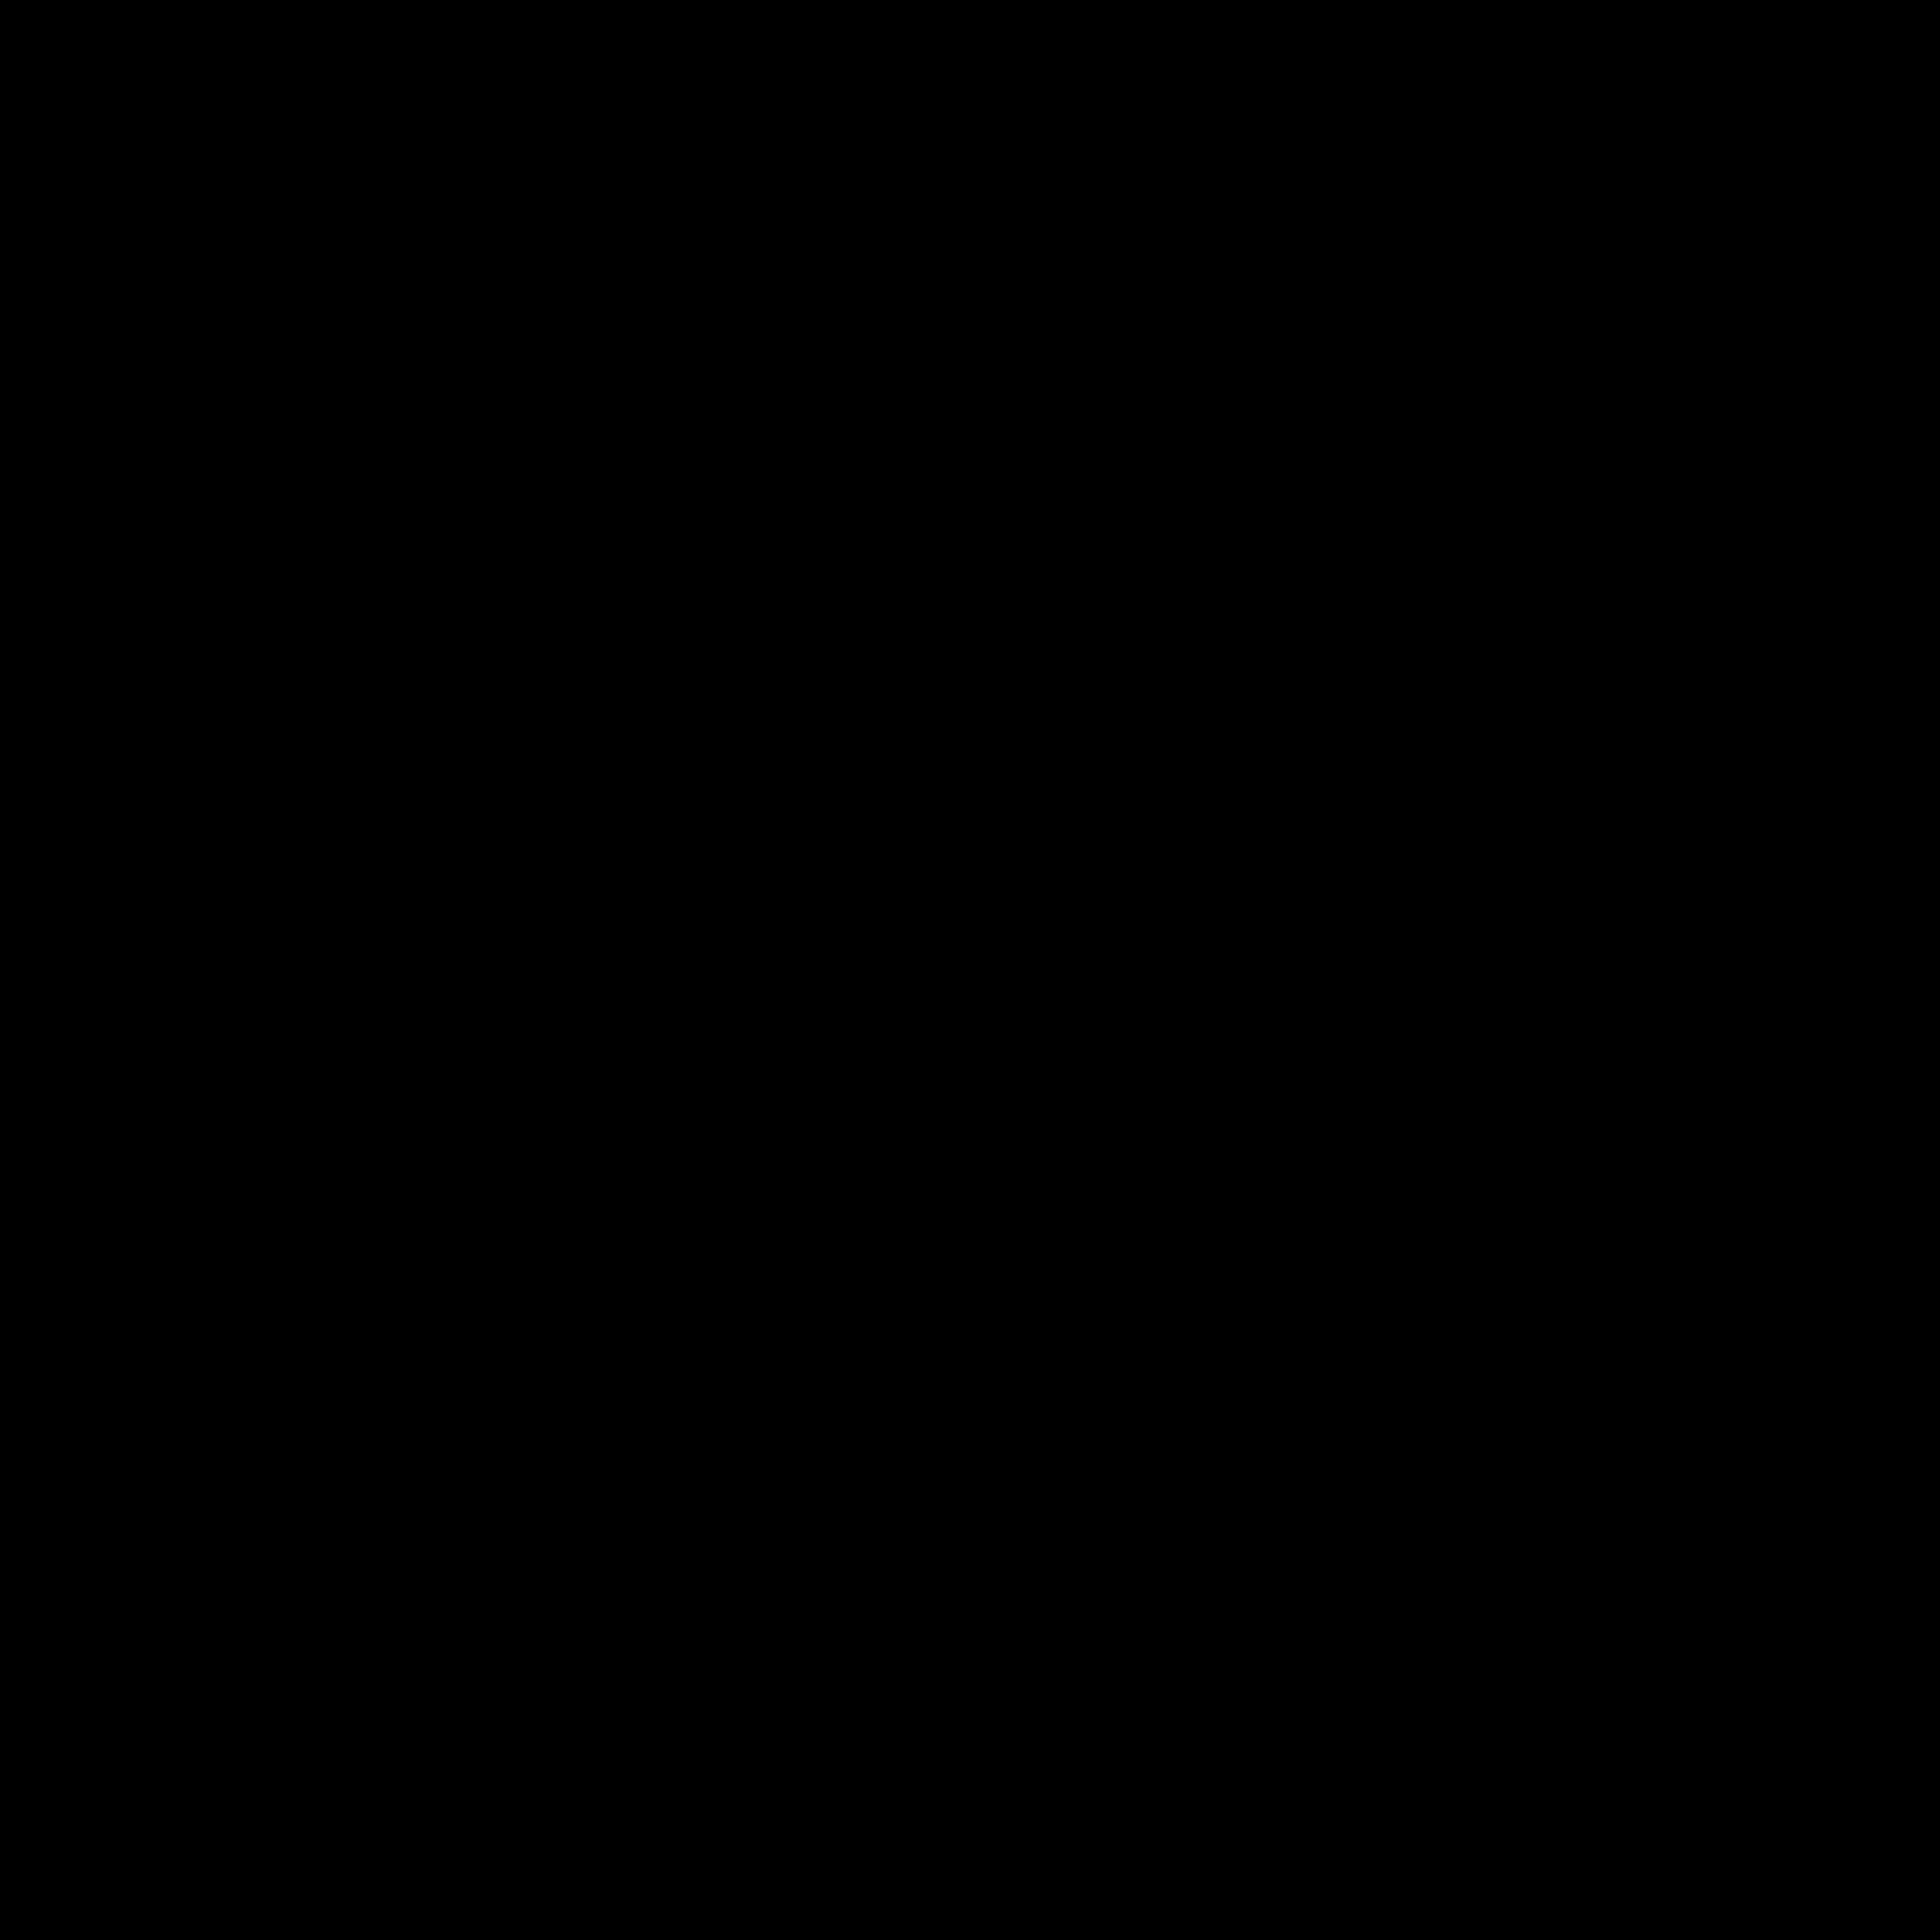 file6-5